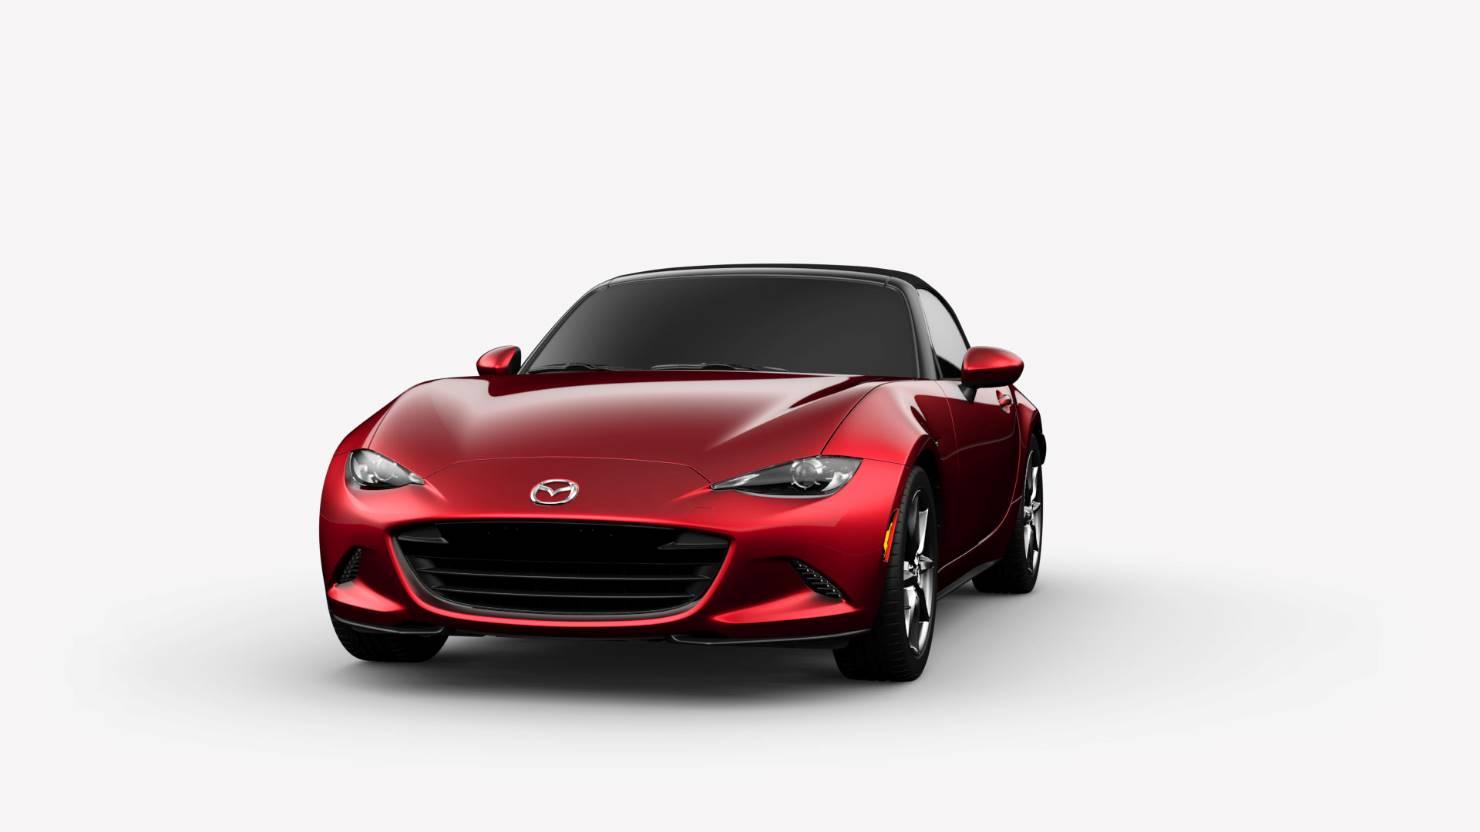 Soul Red Crystal Metallic Mazda Sits In Showroom